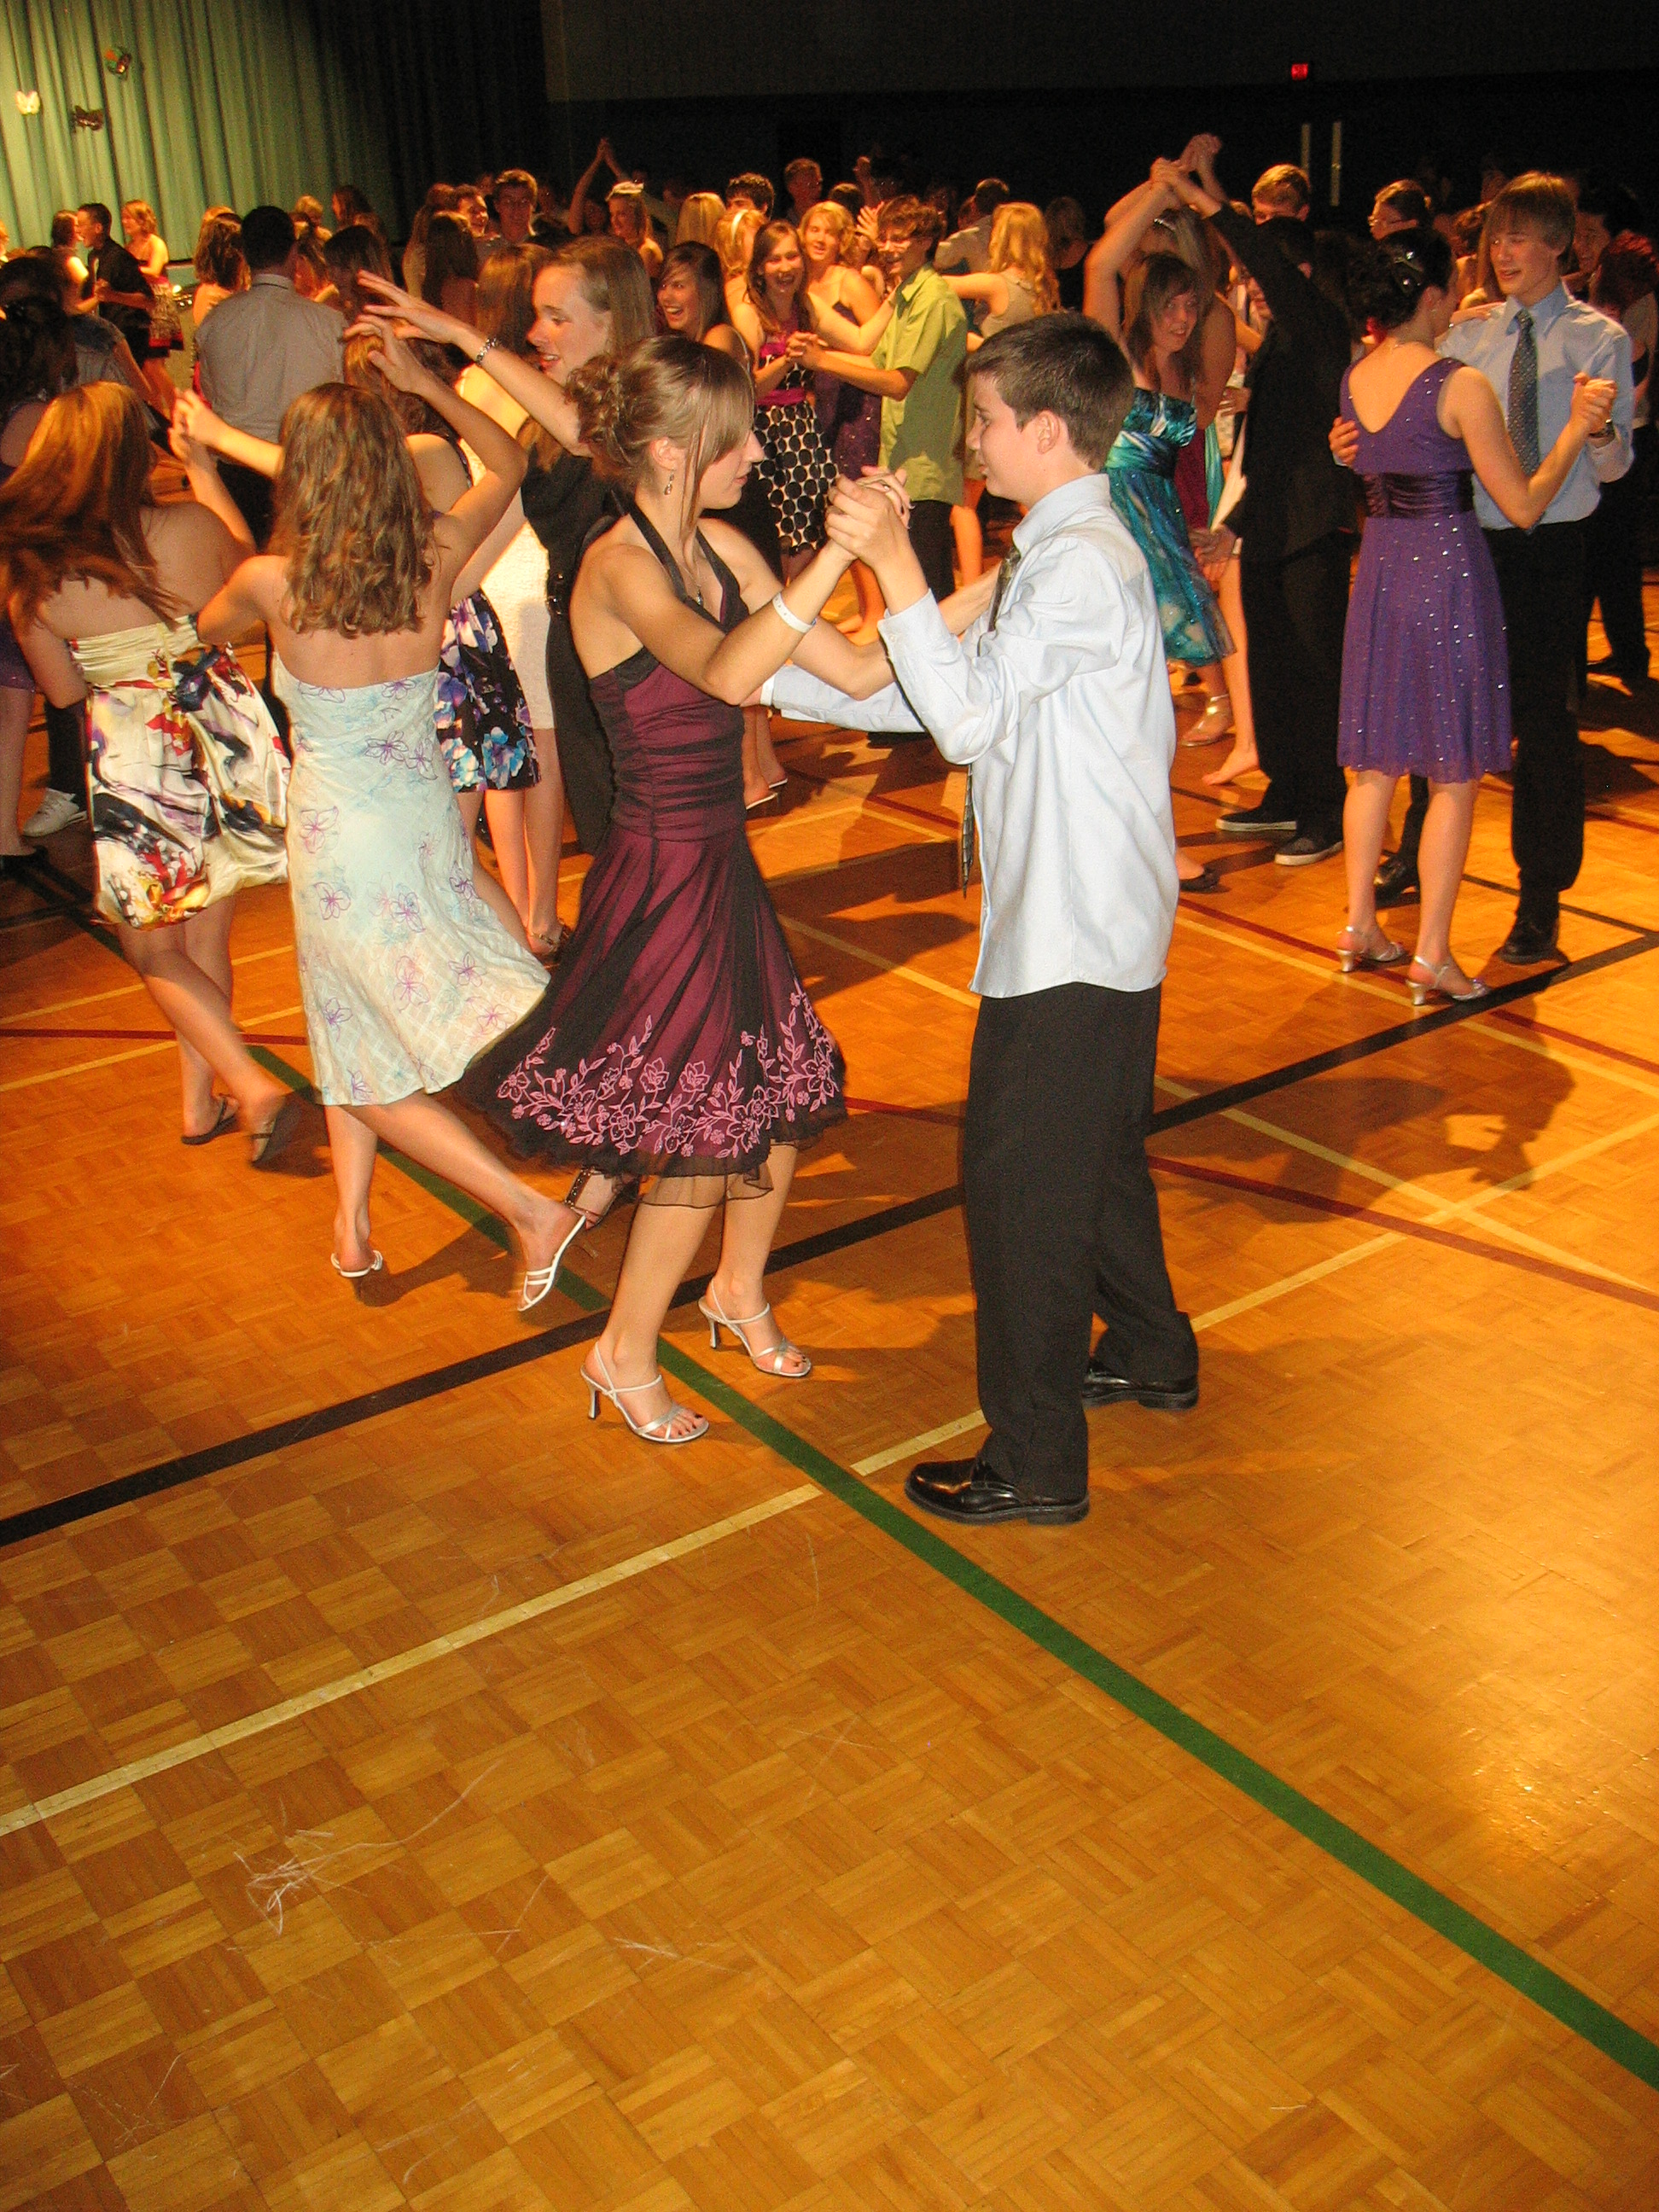 danceScape School & Youth/Teen Programs – Ballroom Dancing, Latin/Salsa, Jive/Swing, danceTONE